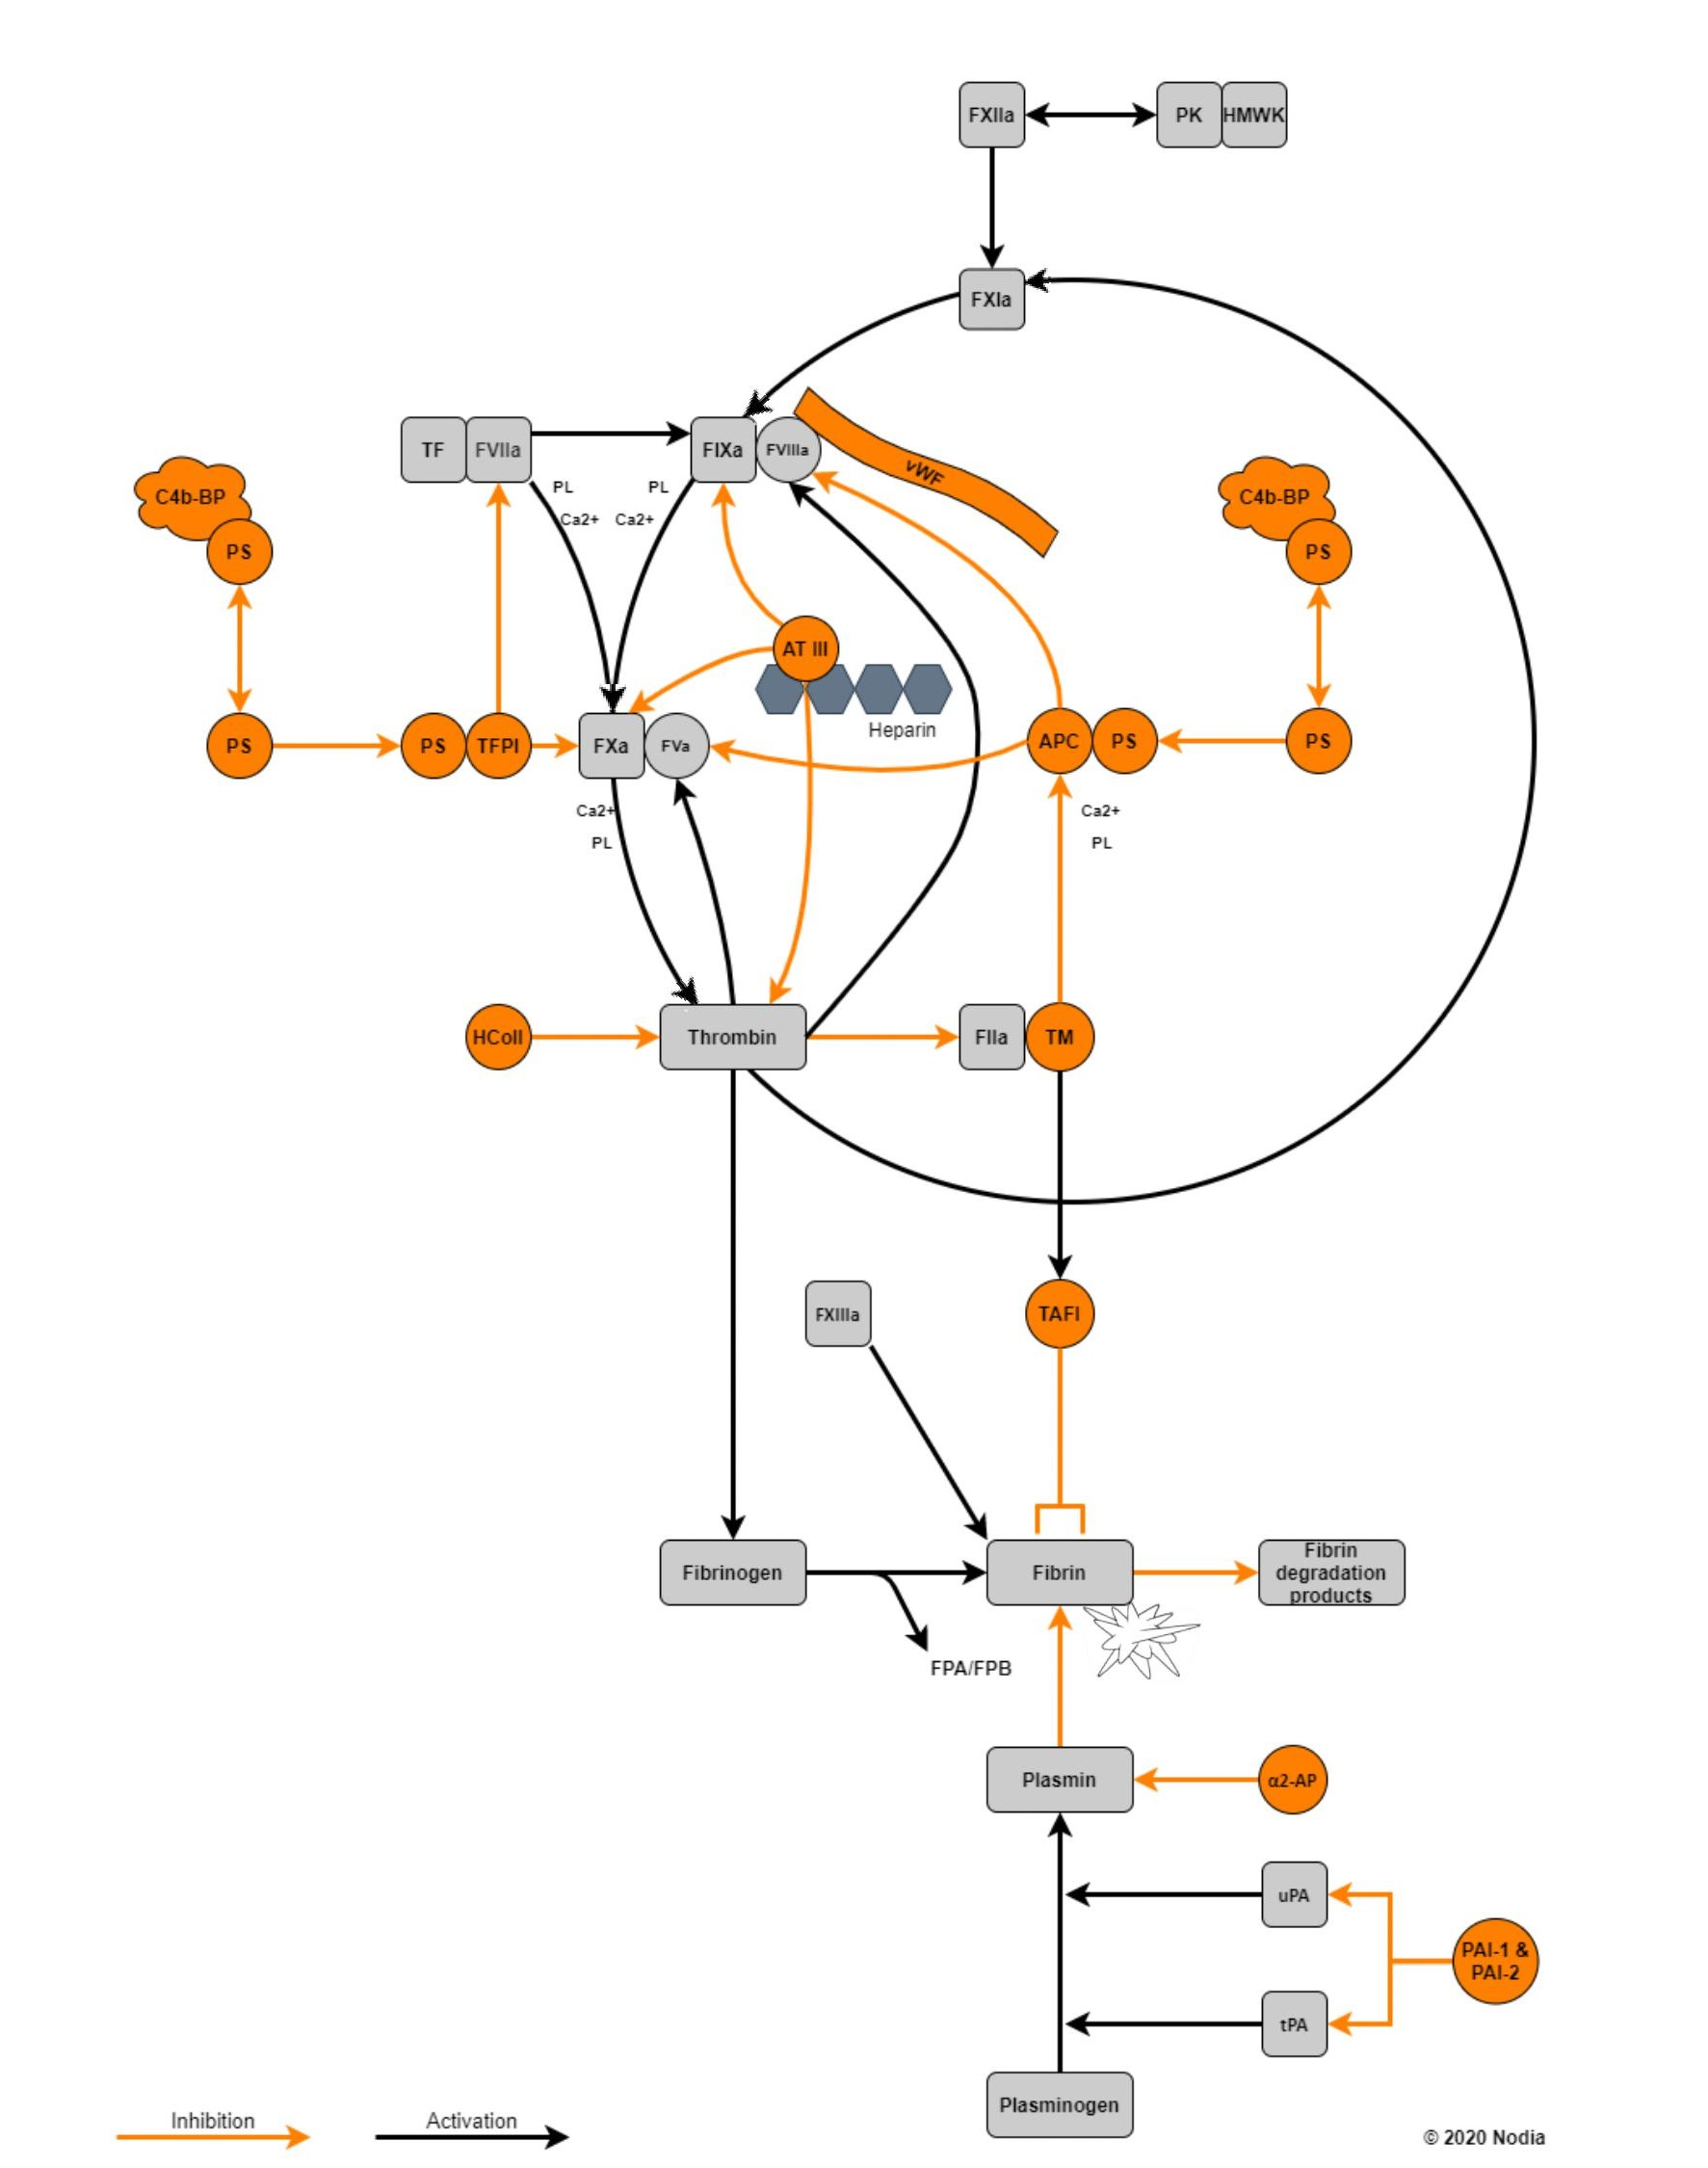 Interactive coagulation pathway